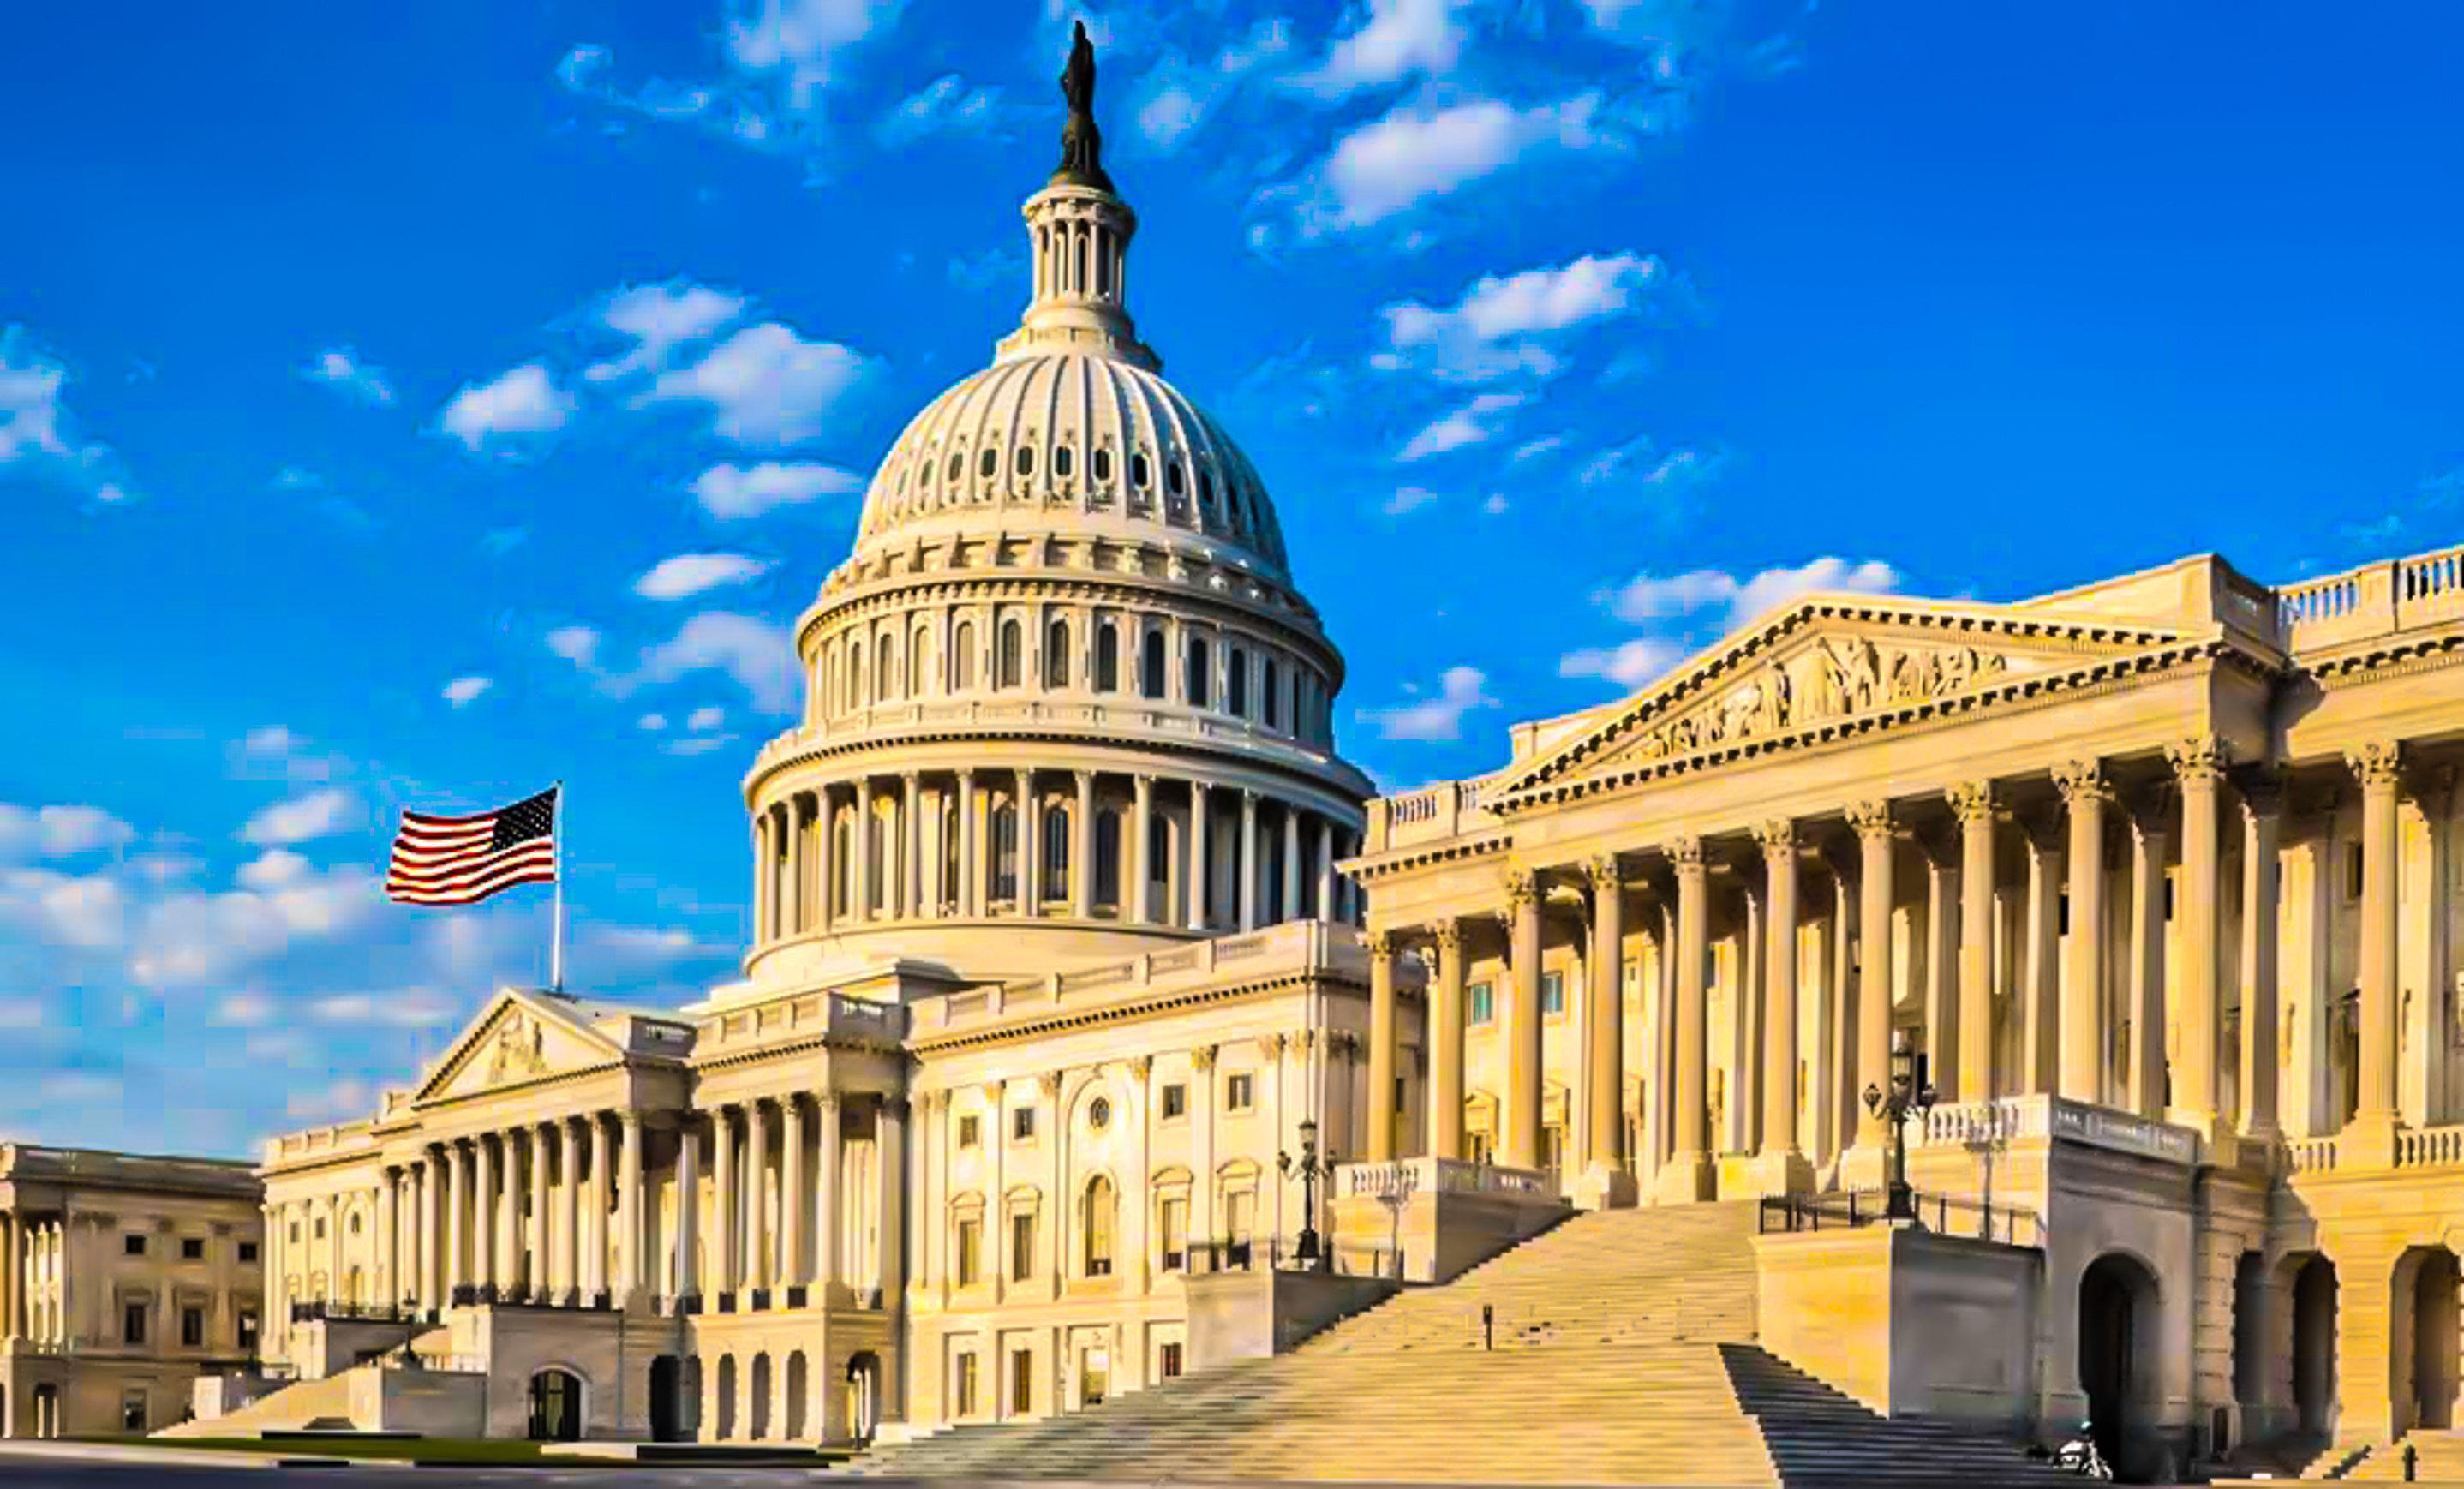 CapitolBuildingUSA.jpg (2.26 MB)